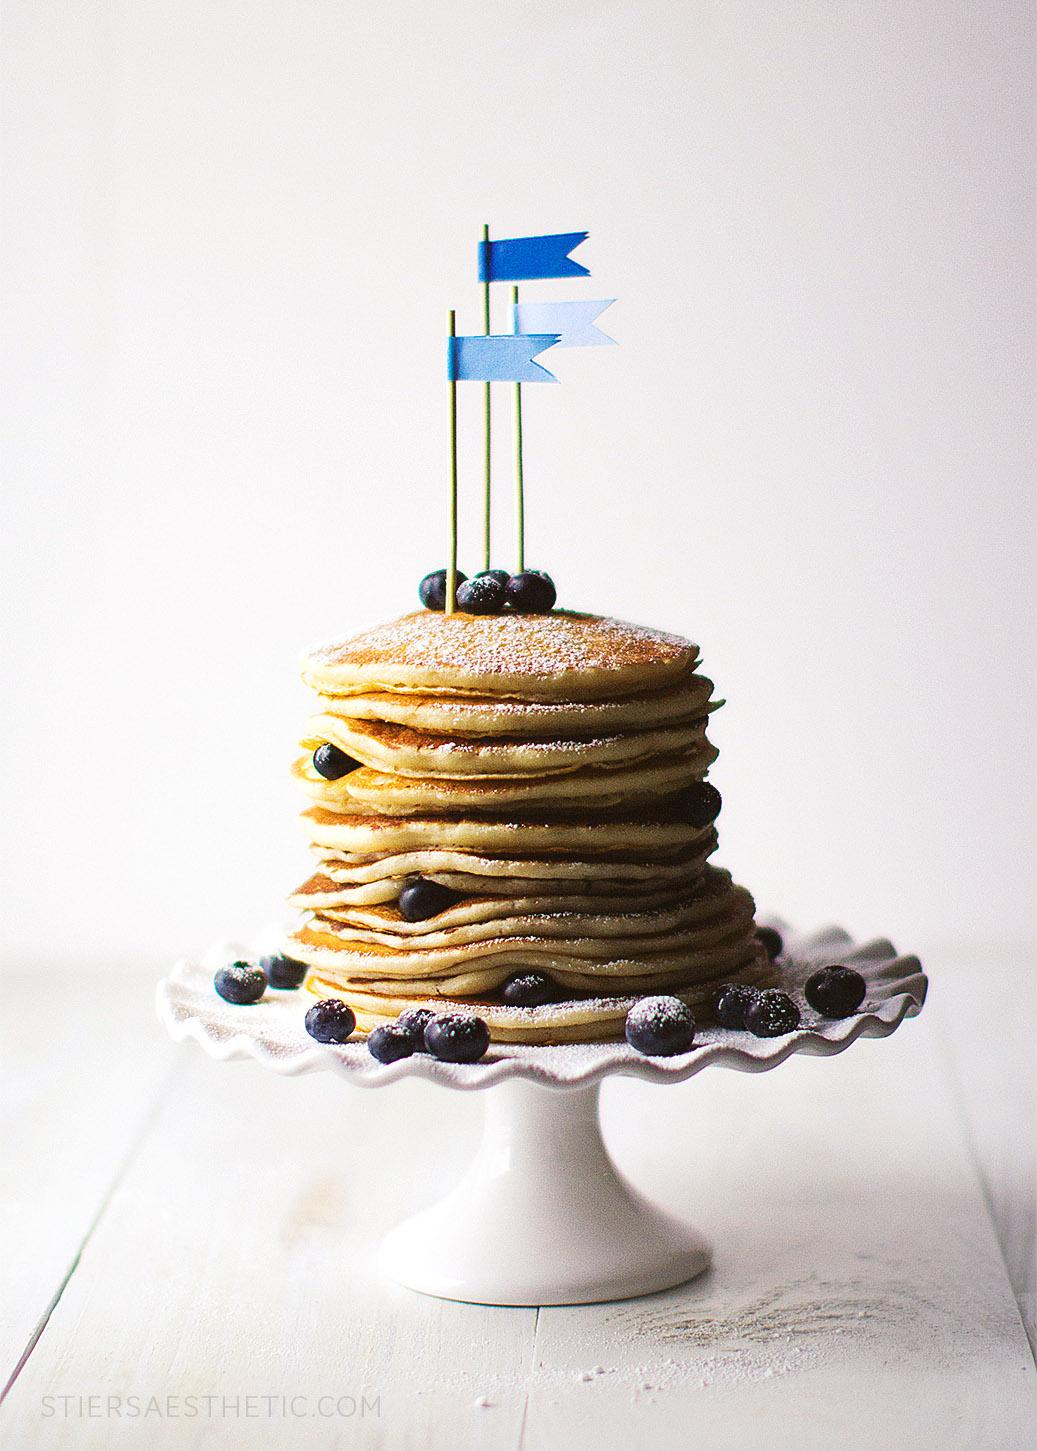 Easy-to-Make Pancakes — Jonathan Stiers